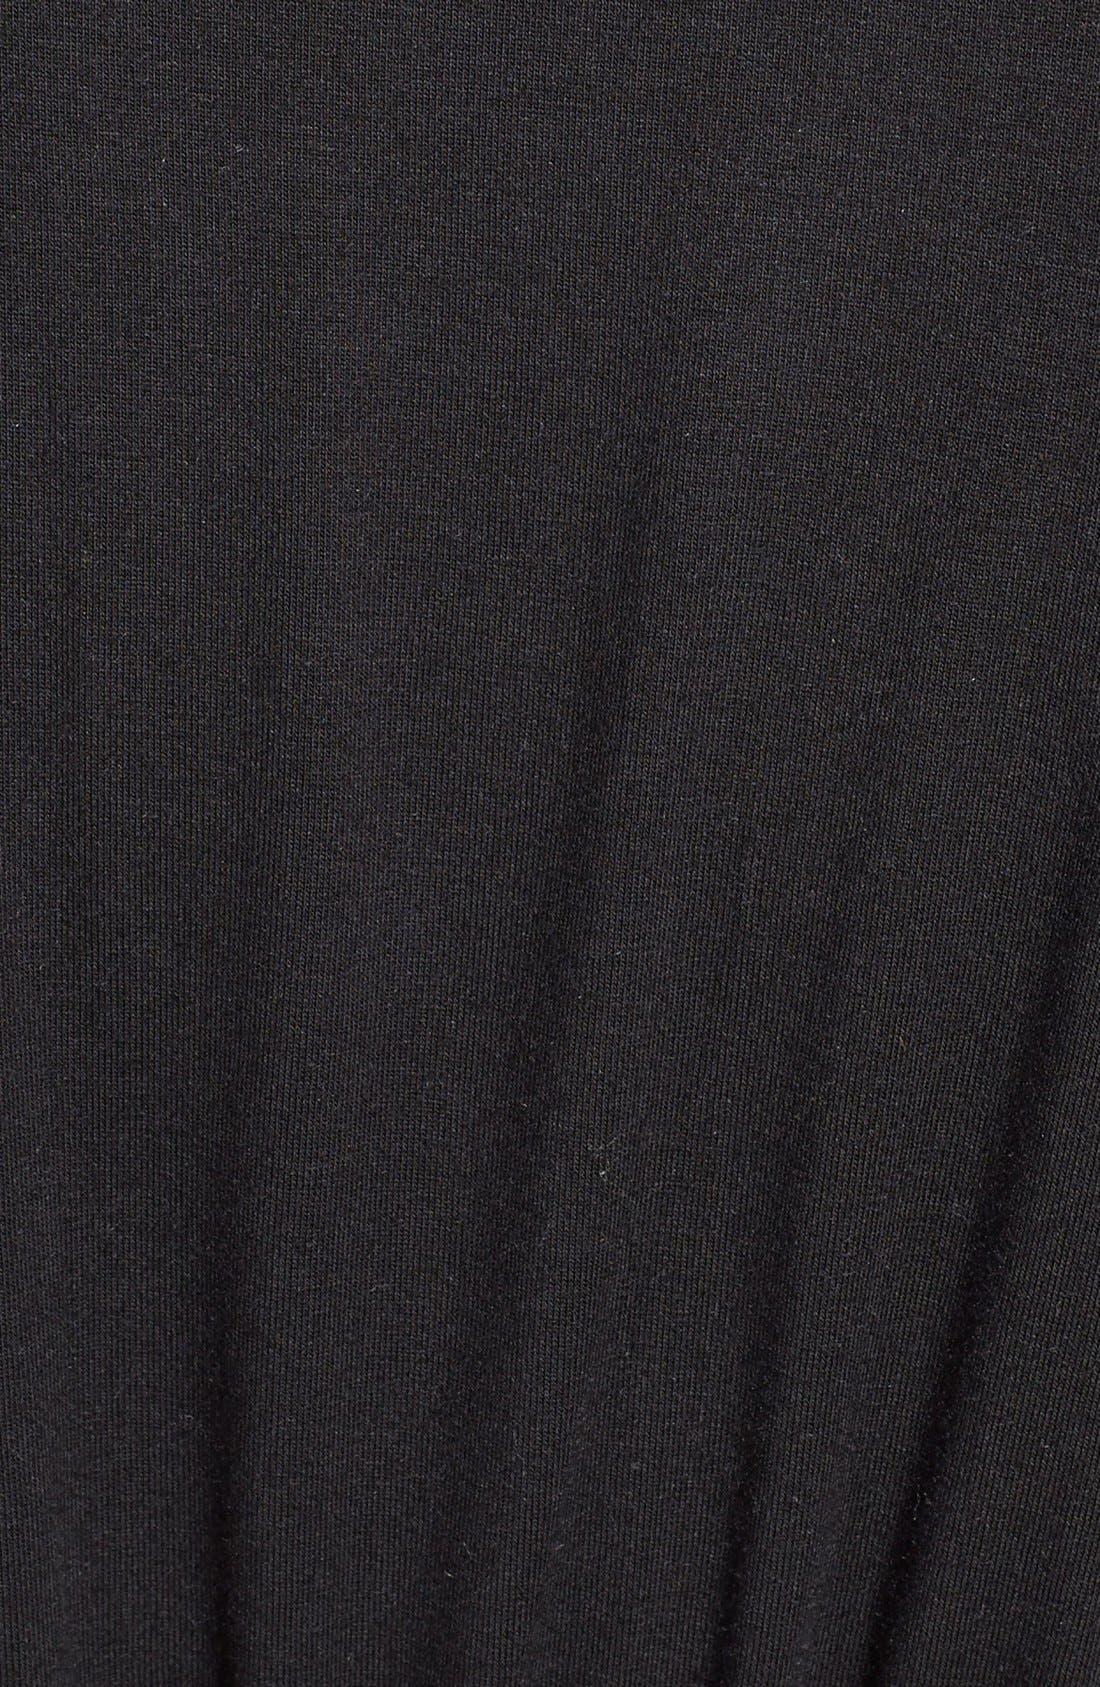 'City Essentials' Short Robe,                             Alternate thumbnail 7, color,                             001